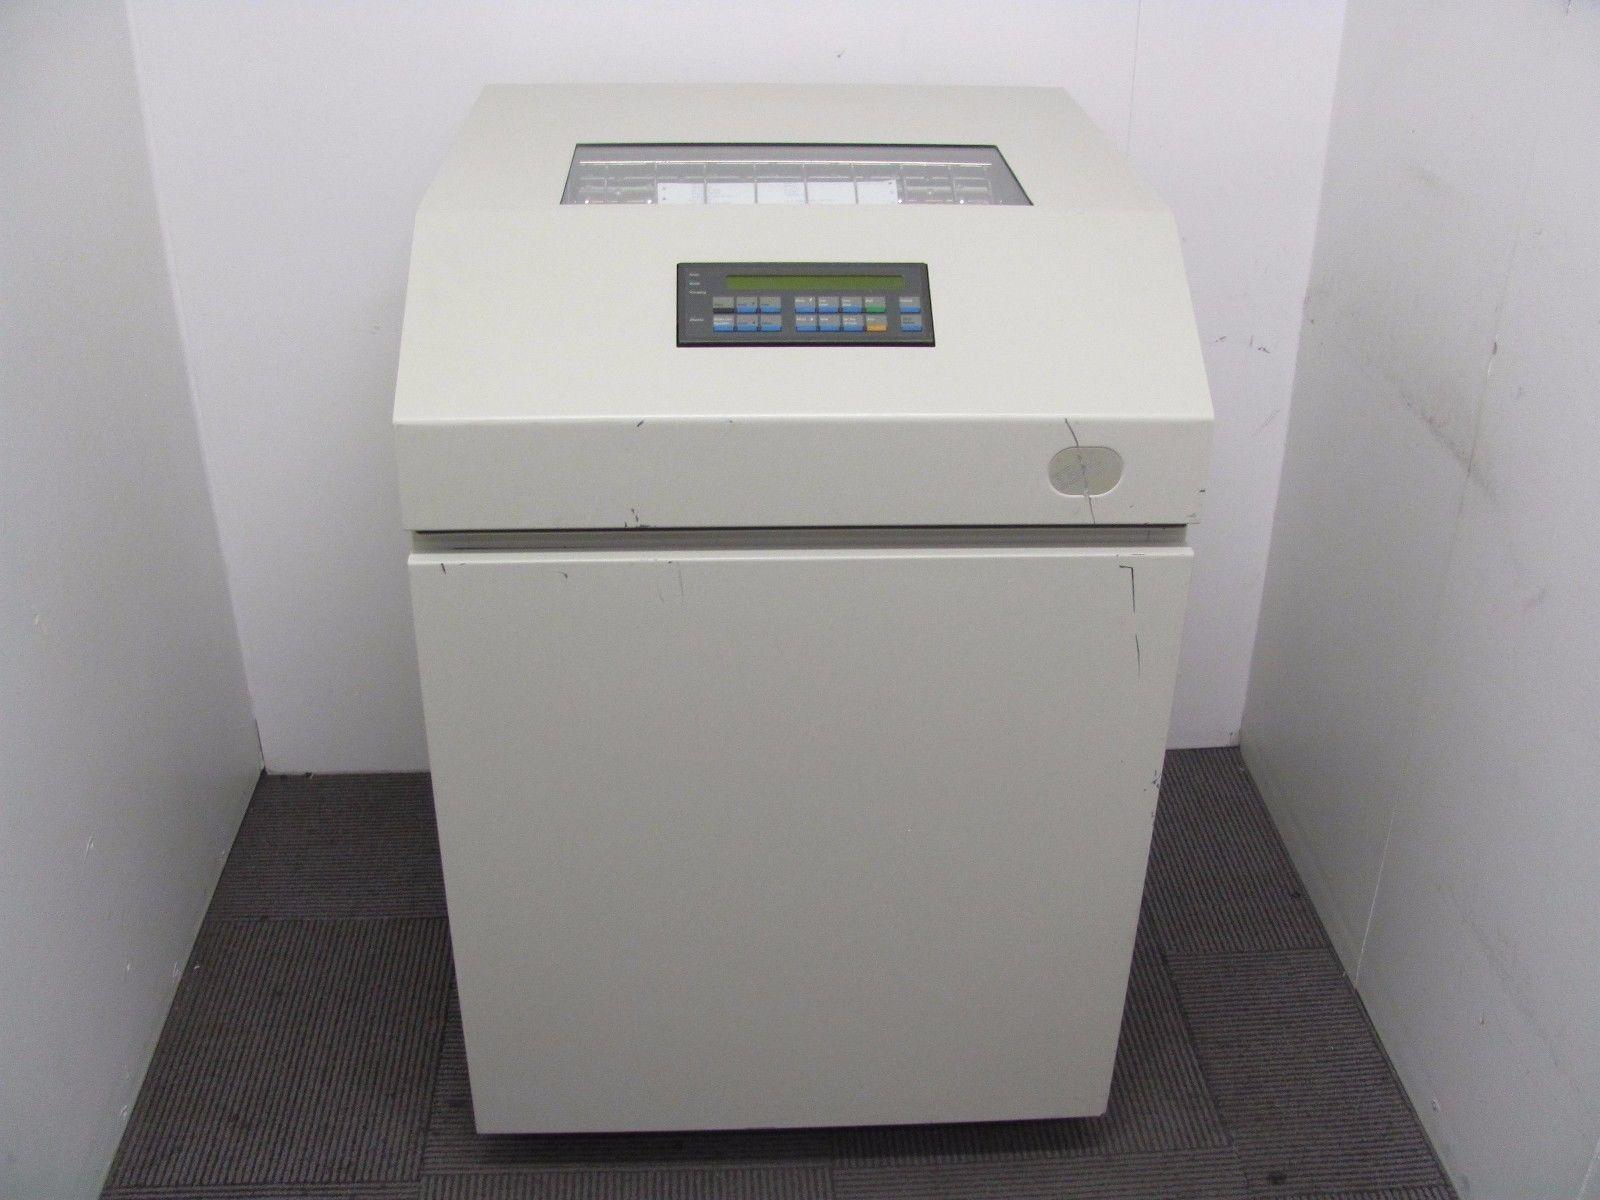 ibm printer manual car owners manual u2022 rh karenhanover co IBM Printer Parts IBM Line Printer